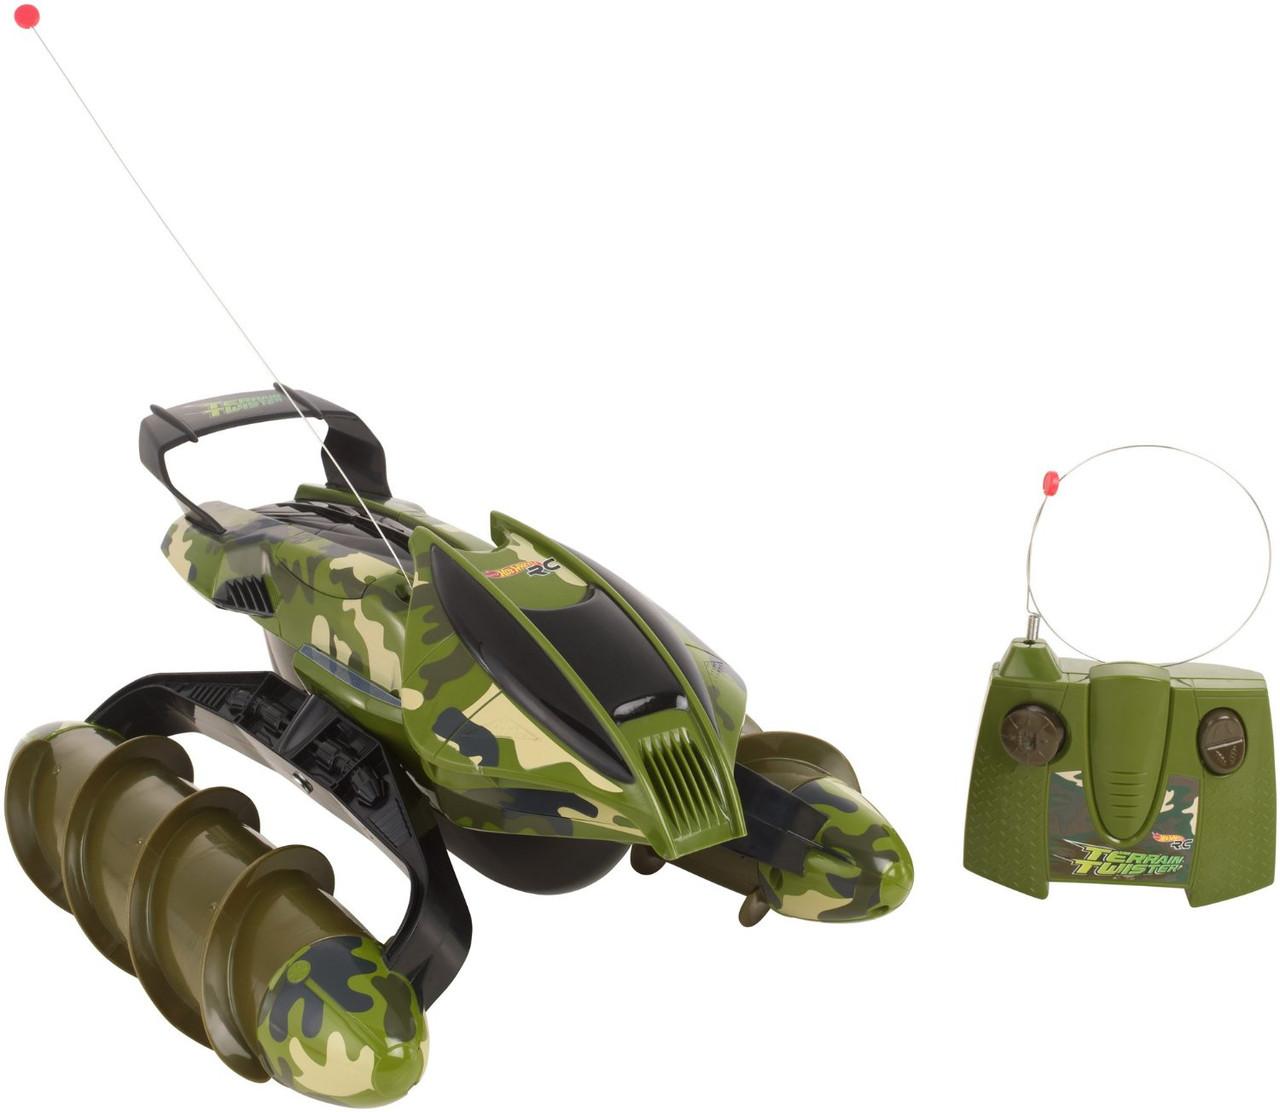 Hot Wheels Вездеход на р/у камуфляжный RC Terrain Twister Camo